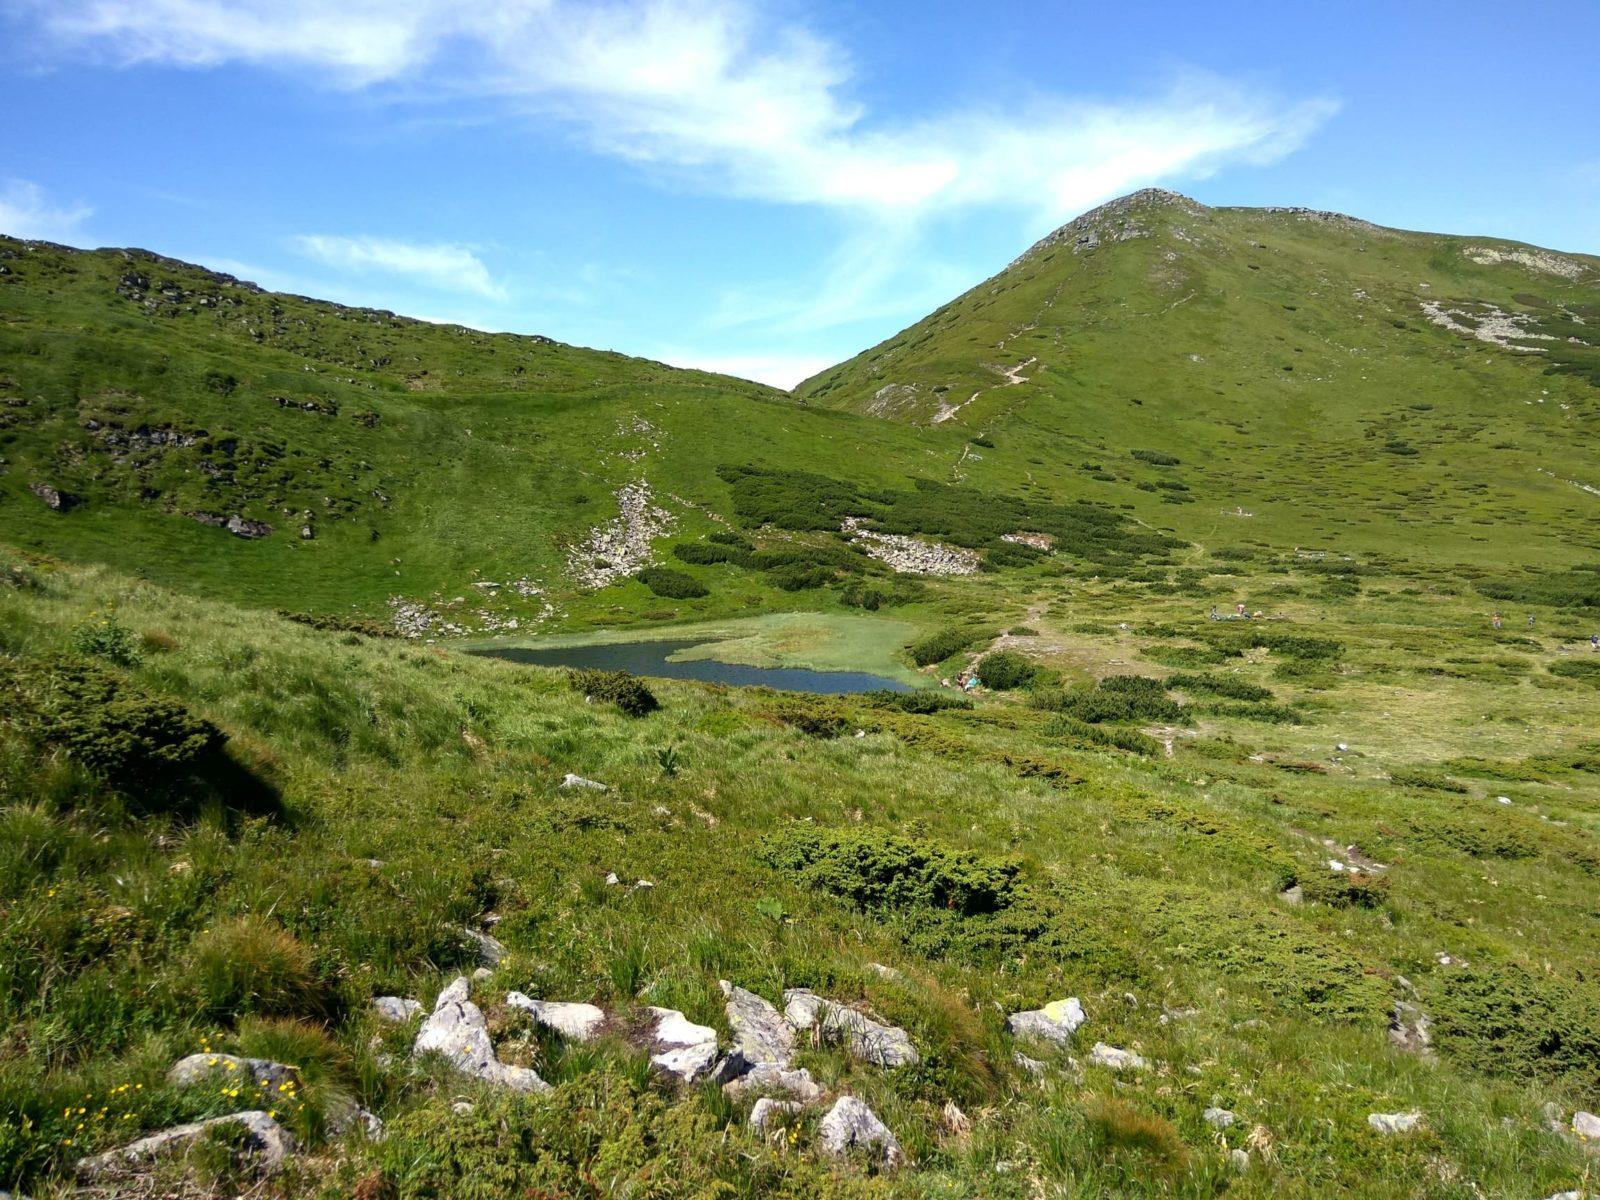 говерла - найвища вершина України